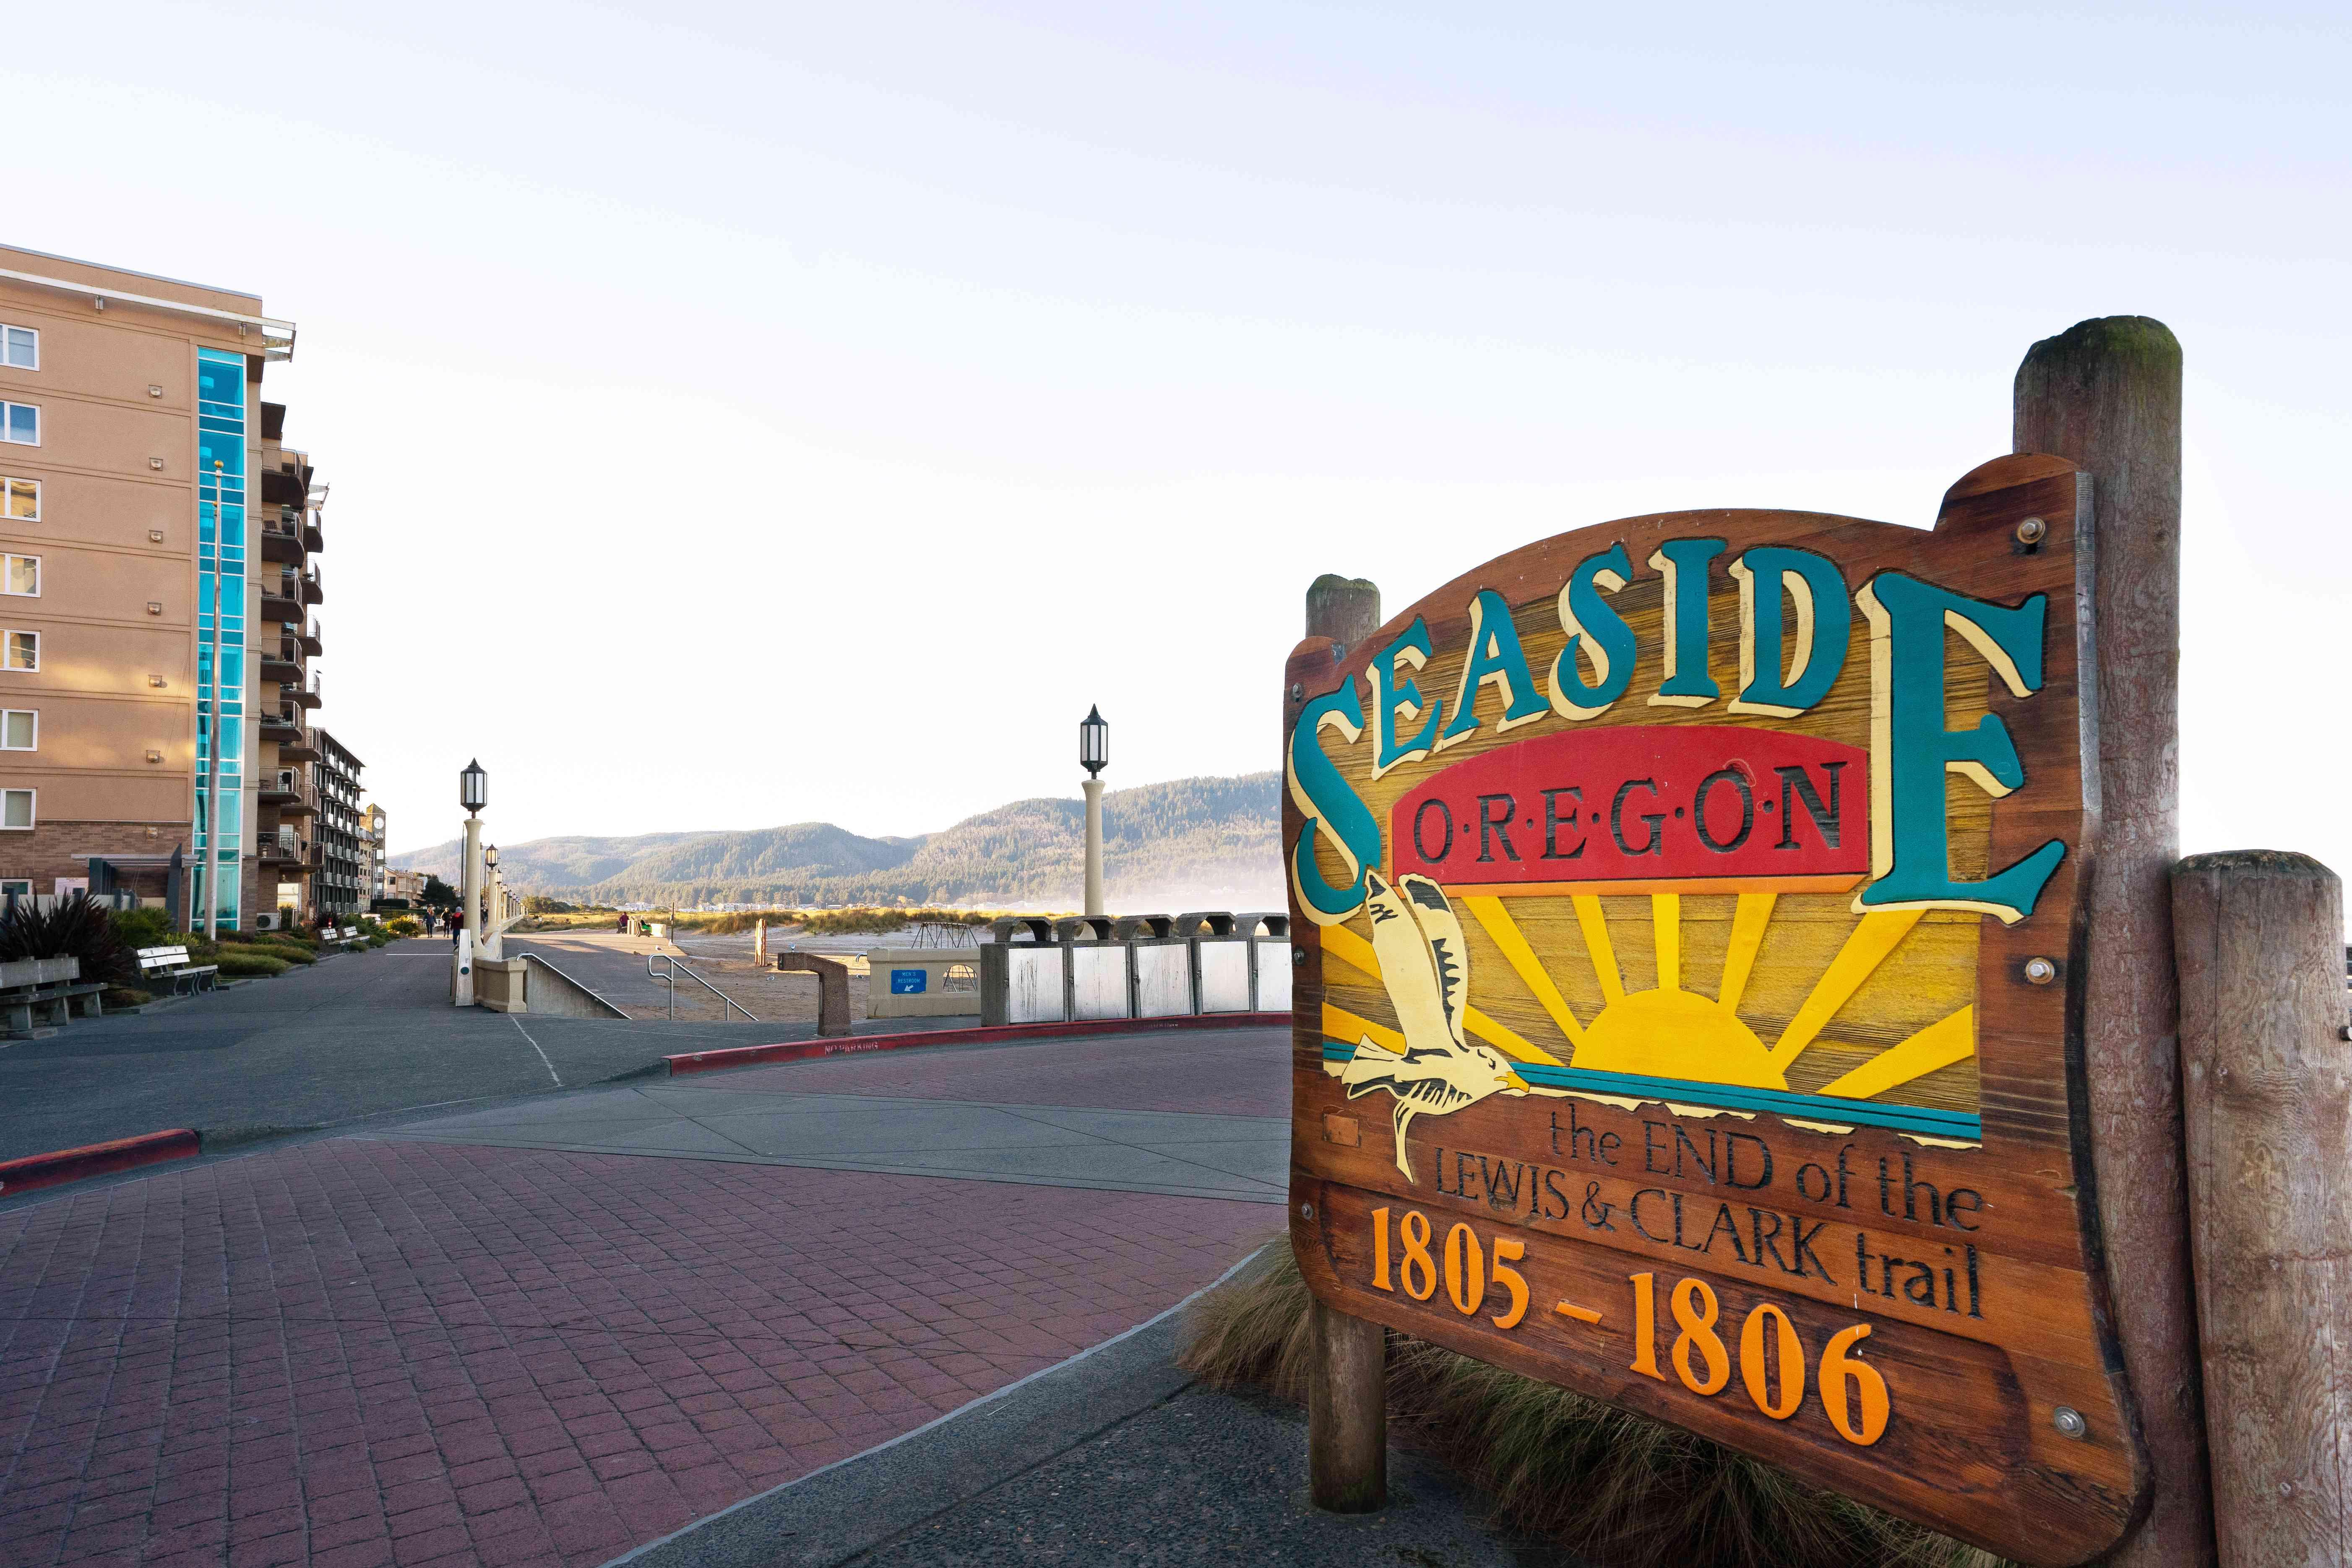 The beginning of the Seaside Promenade